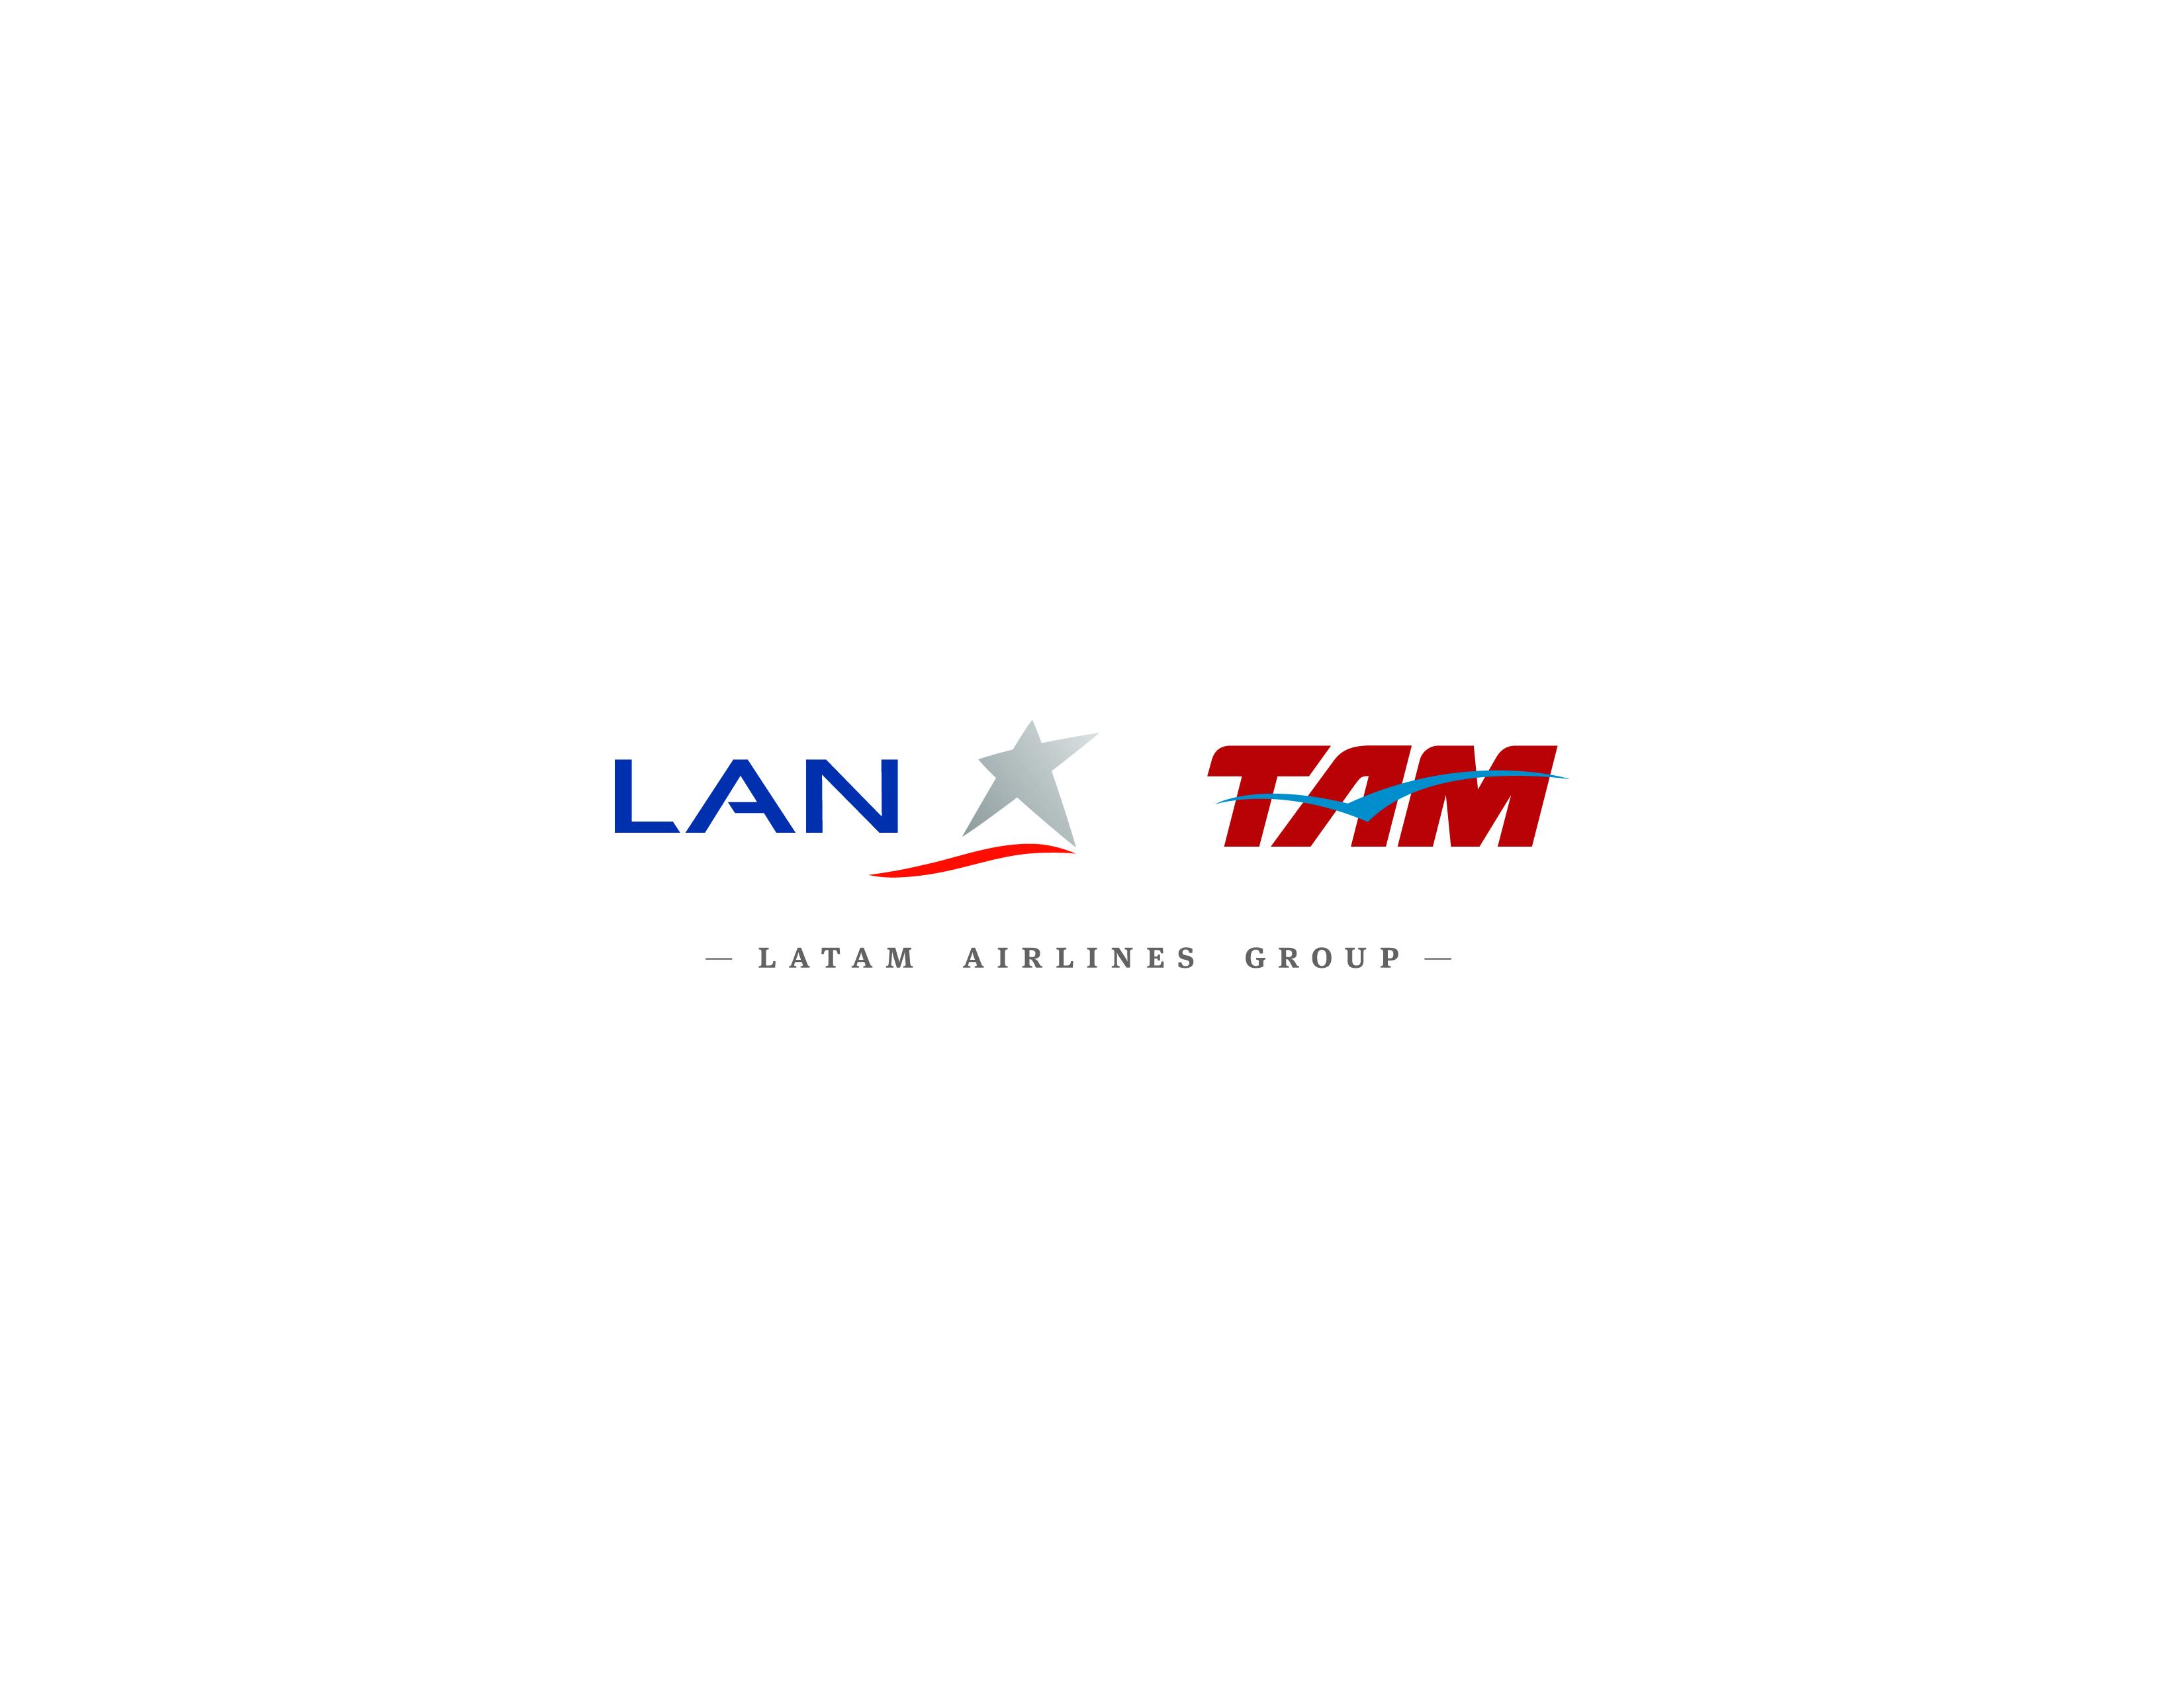 latam airlines logo - photo #18